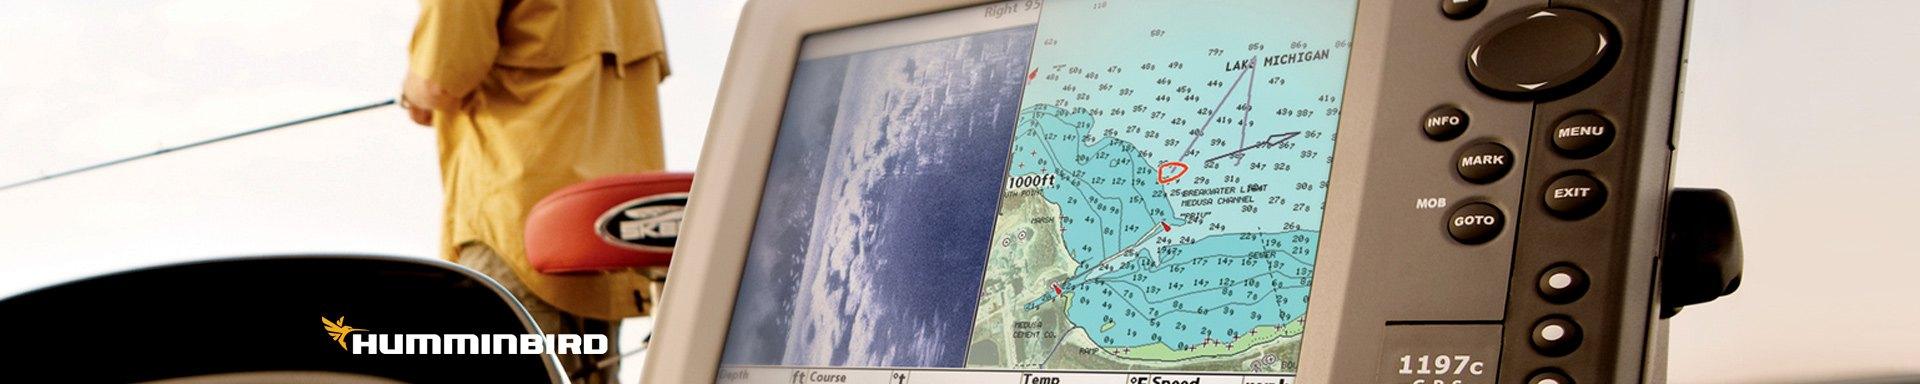 Humminbird™   Marine Fish Finders, Depth Finders, Cables